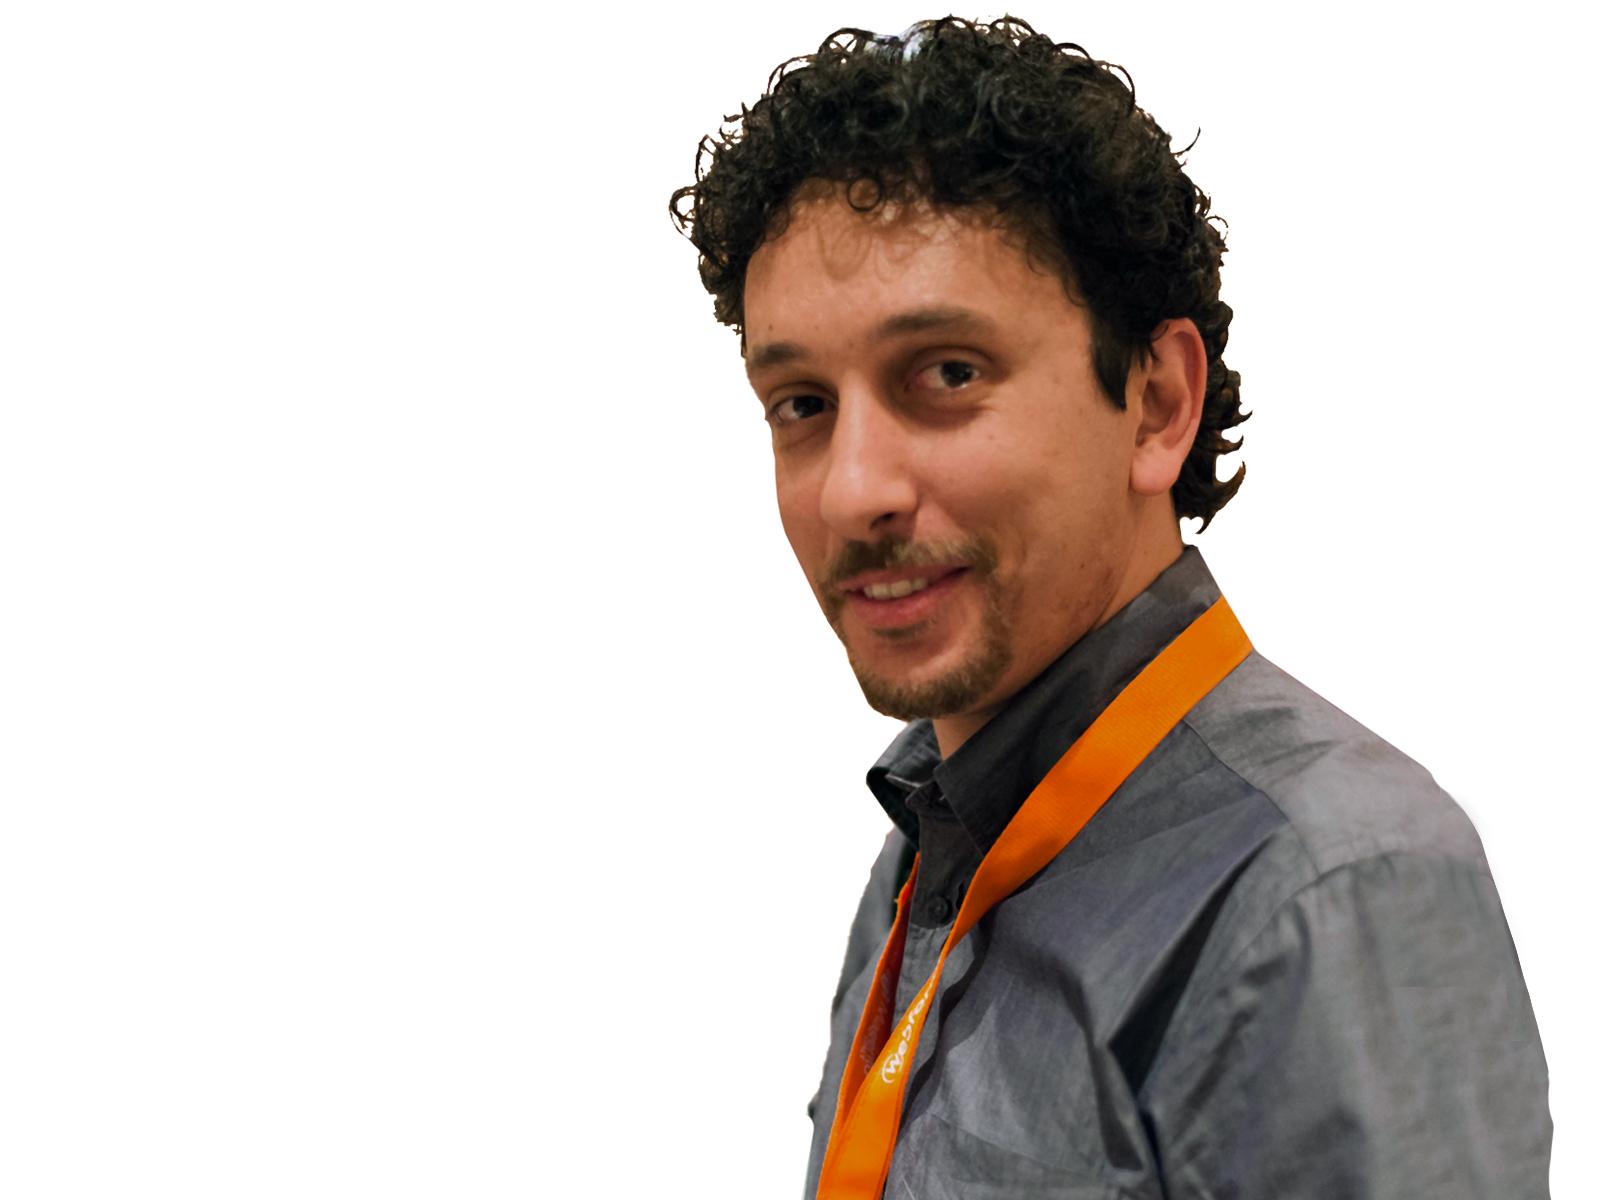 Riccardo Tempesta